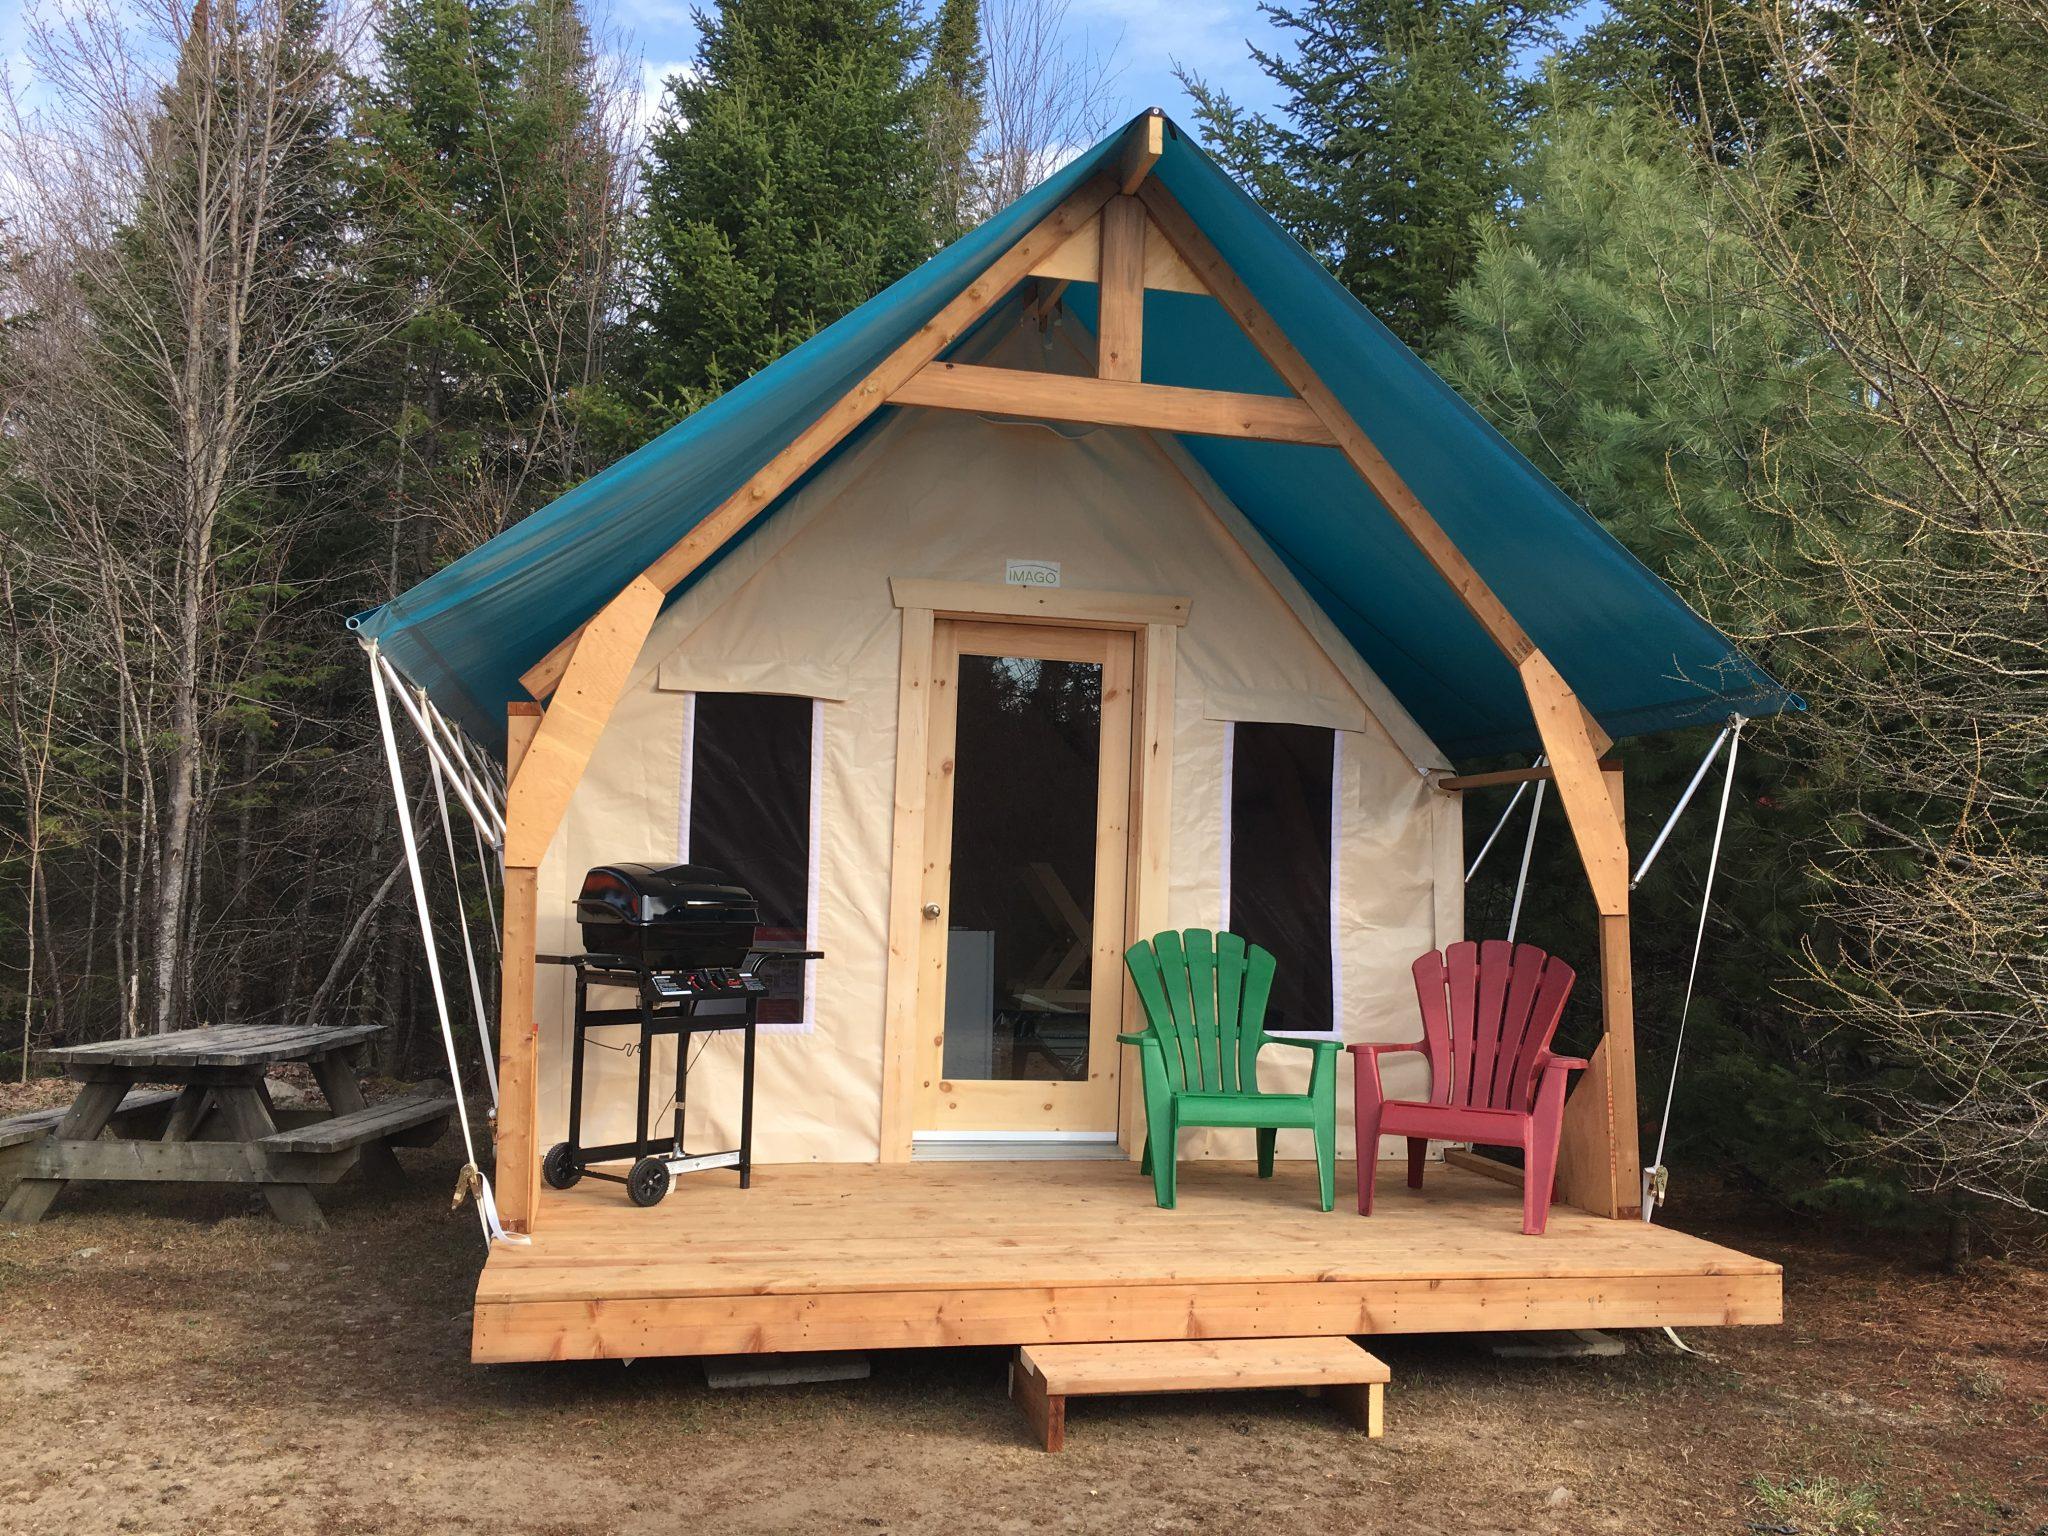 Tente glamping du camping du Domaine Lausanne